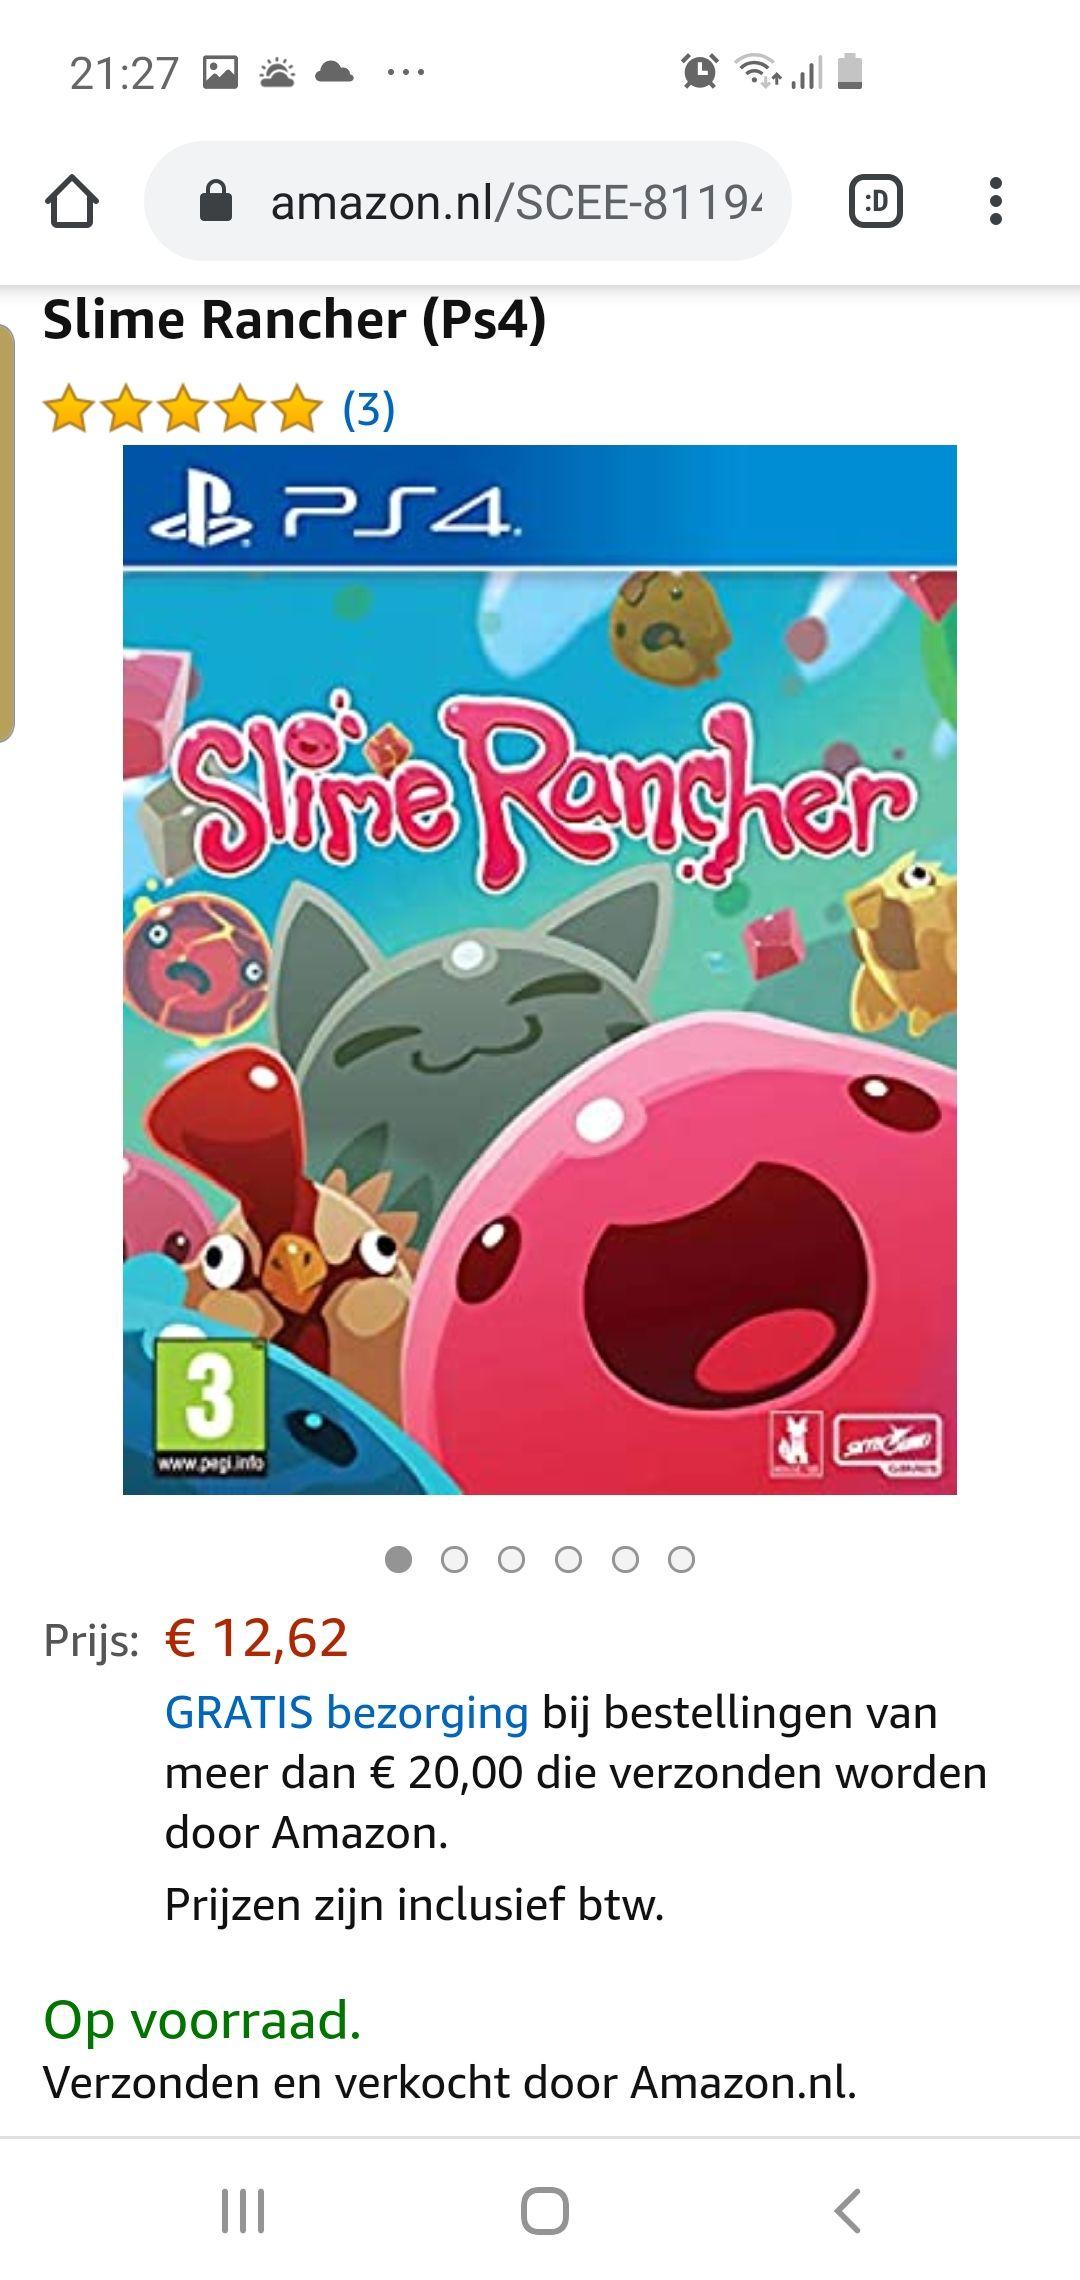 Slime Rancher (Ps4) @ Amazon.nl